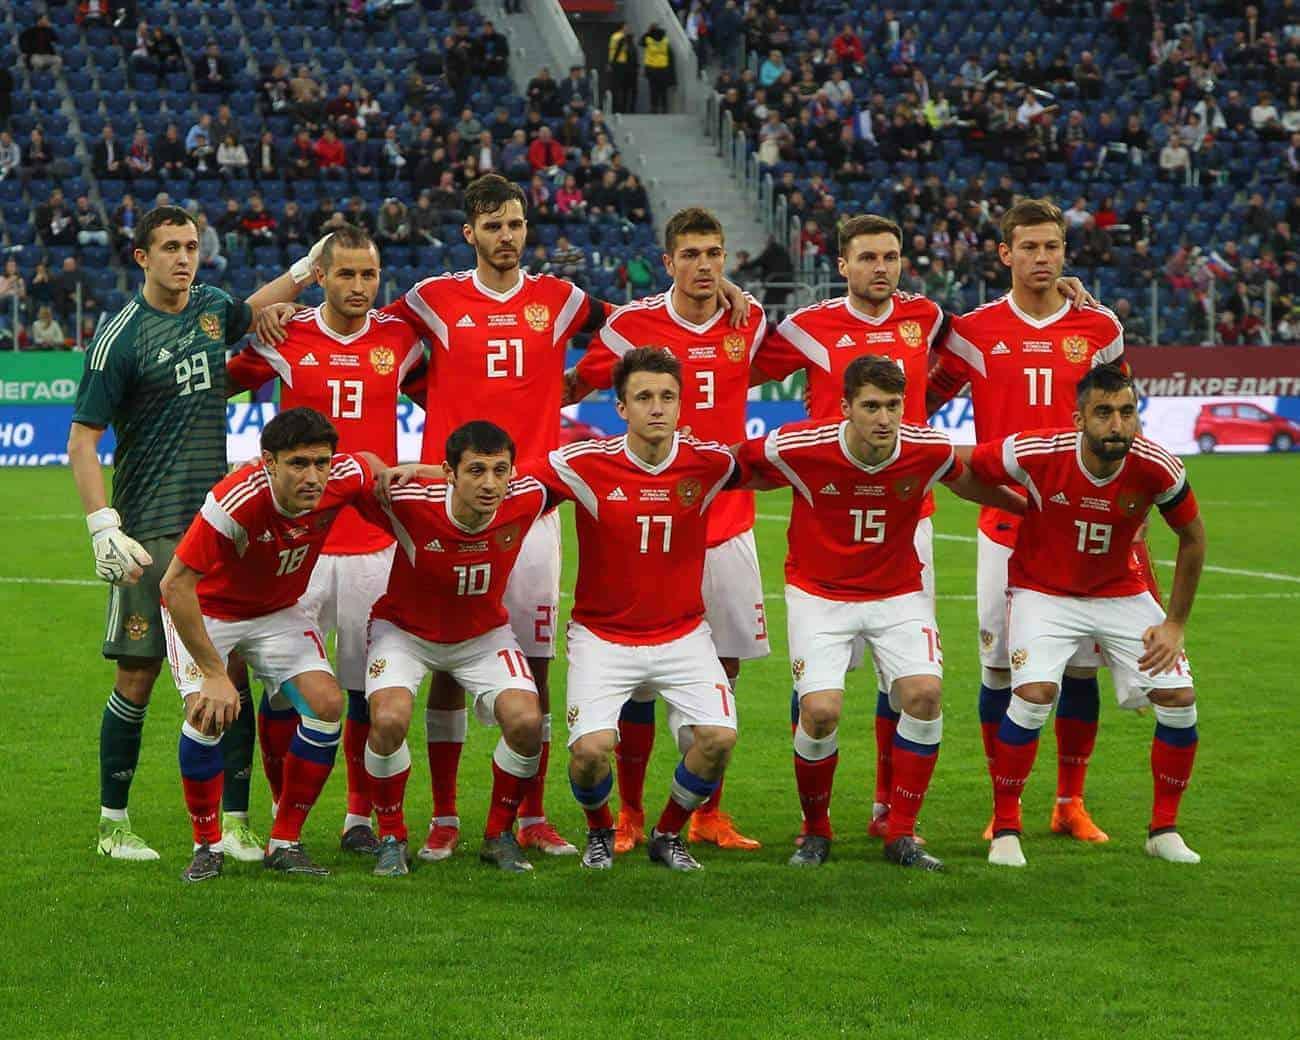 Fußball WM 2018 - Gelingt Russland der Gruppensieg?